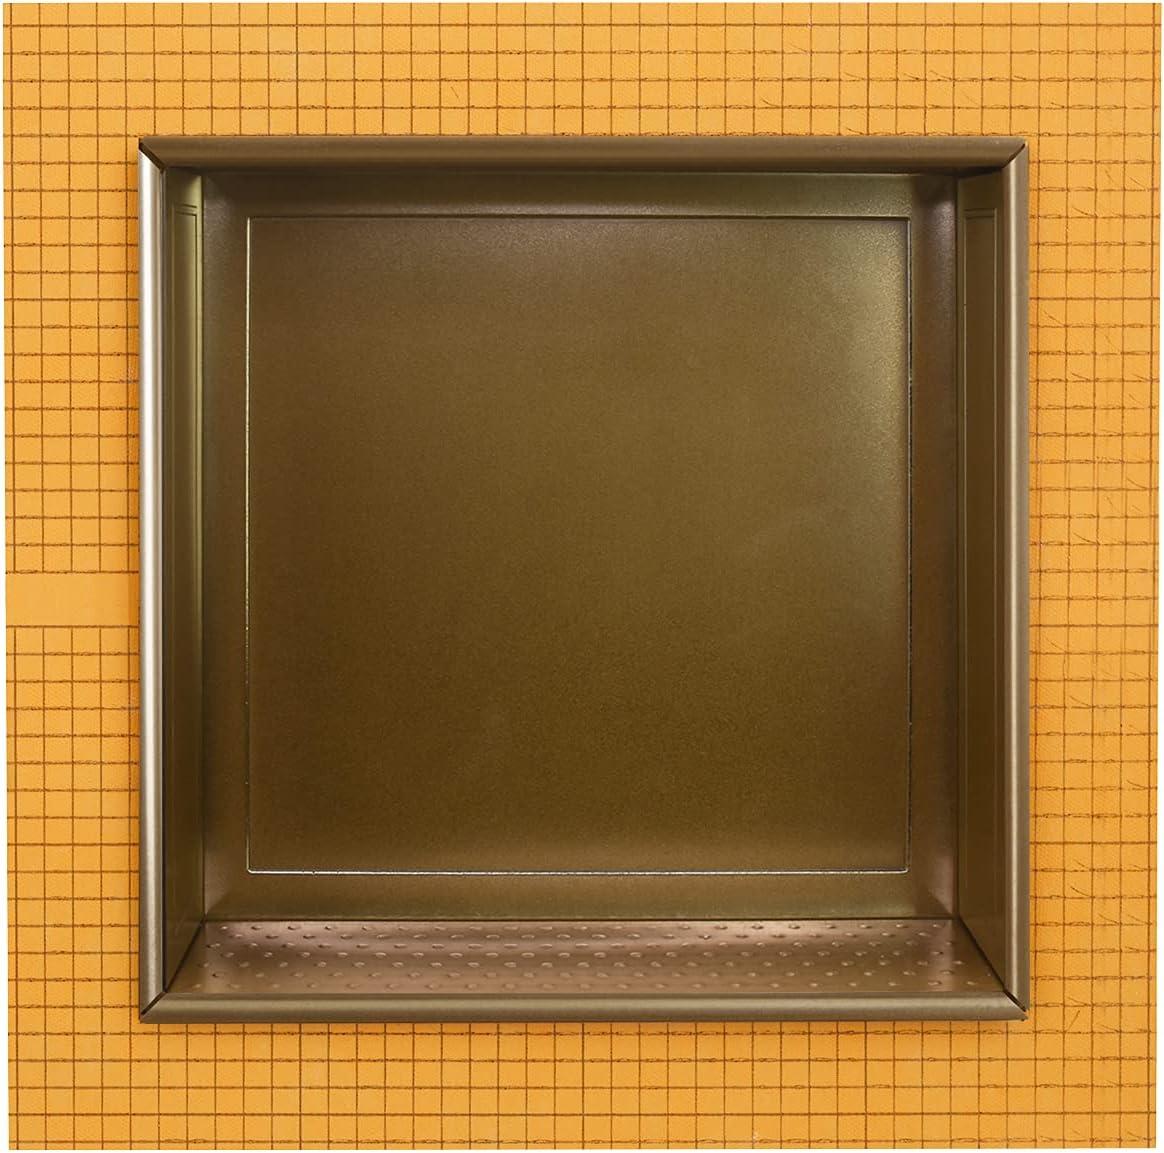 Schluter Kerdi Board 12 x inch Recessed Pre Reservation Niche Tile Excellent Shower